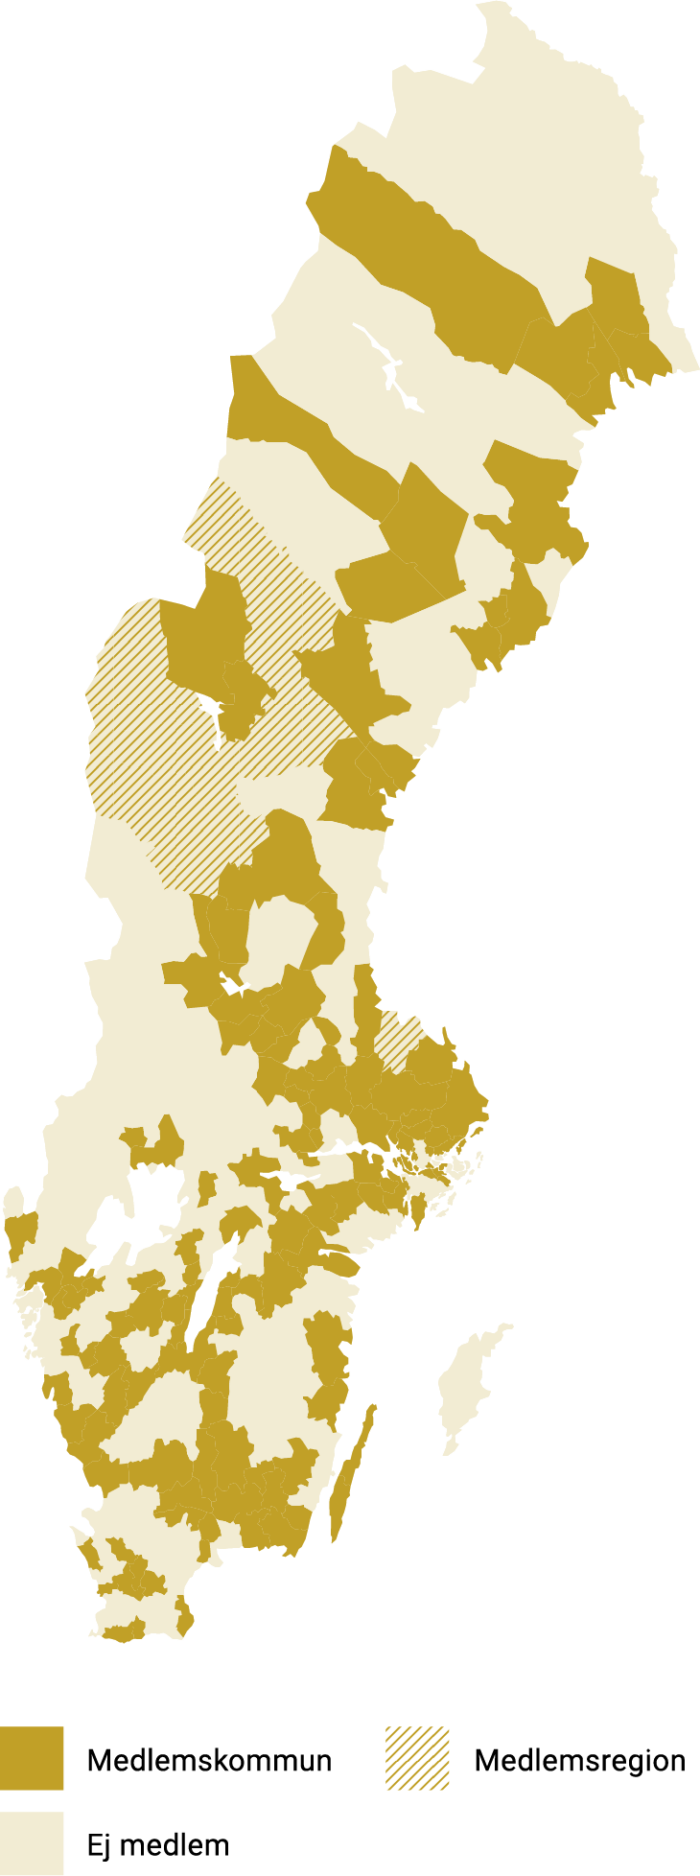 Karta över medlemskommuner